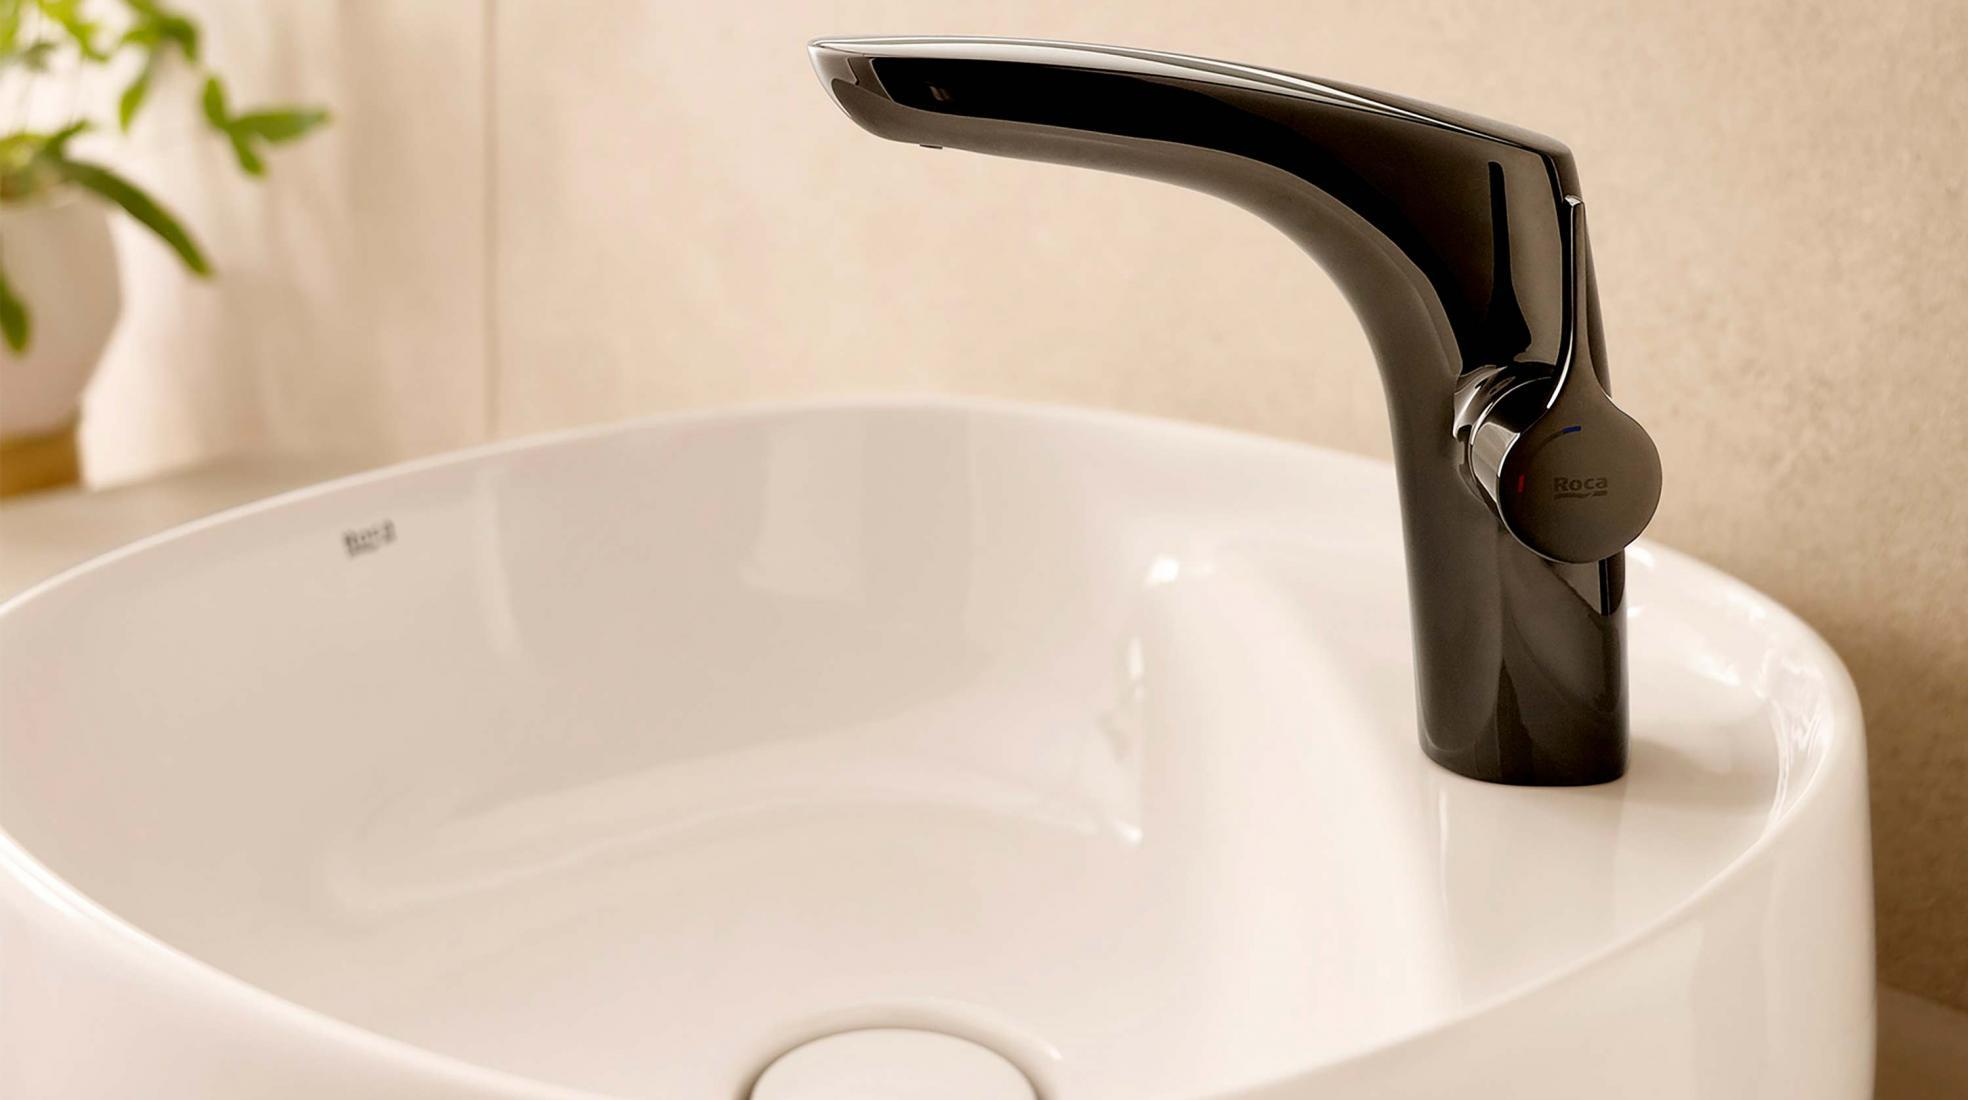 Grifos negros para lavabo o ducha: muestra tu carisma │ Roca Life